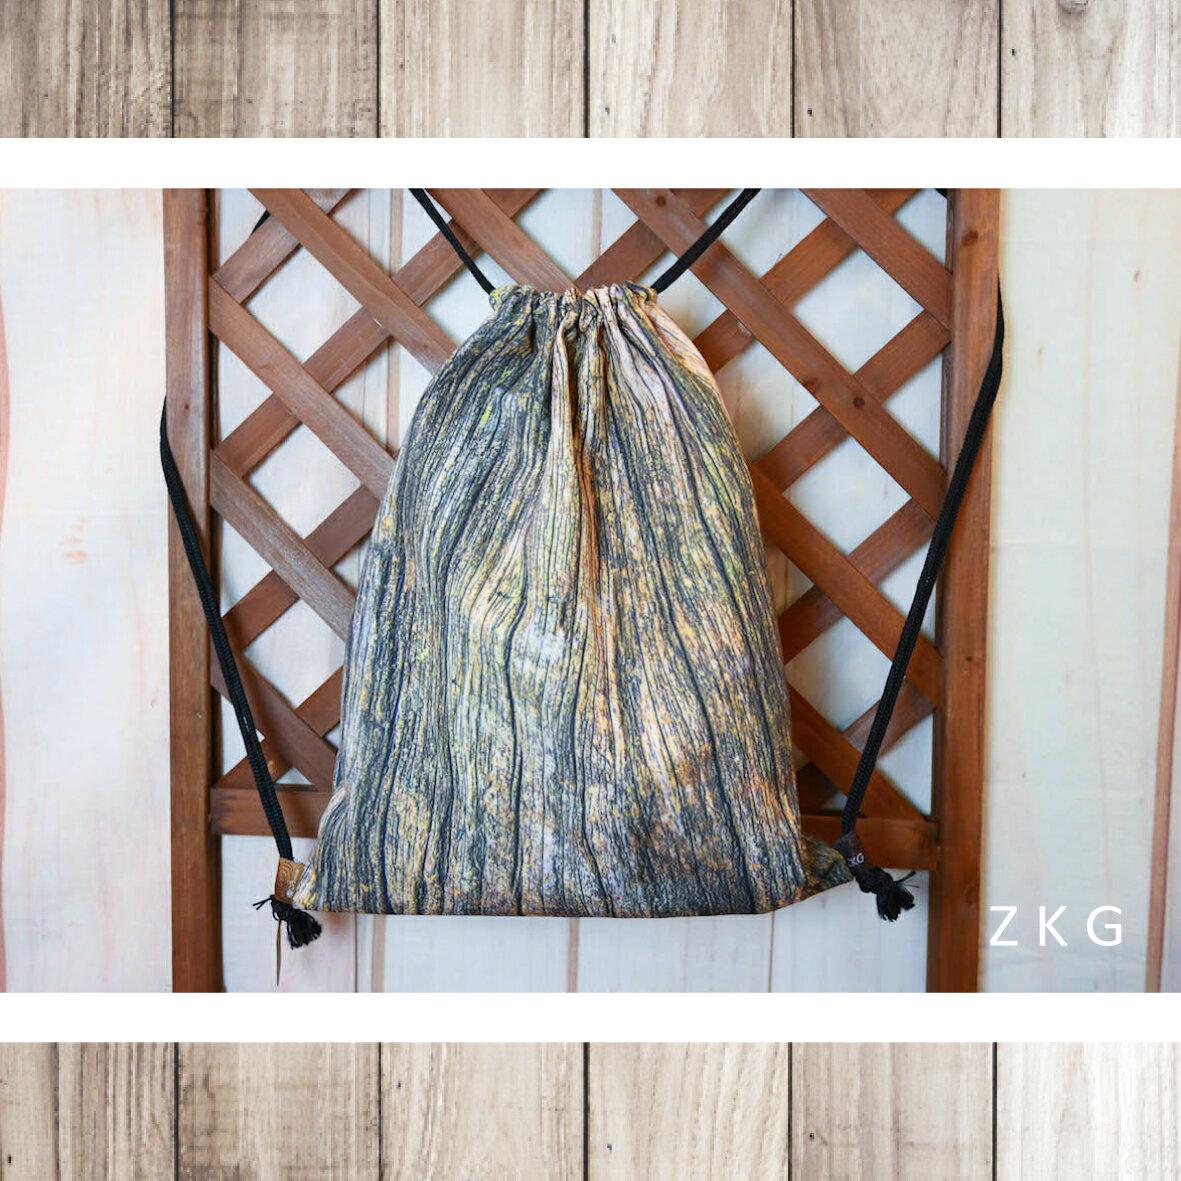 ZKG 木系列-束口後背包-單個入 台灣(手工製)*送禮*自用*